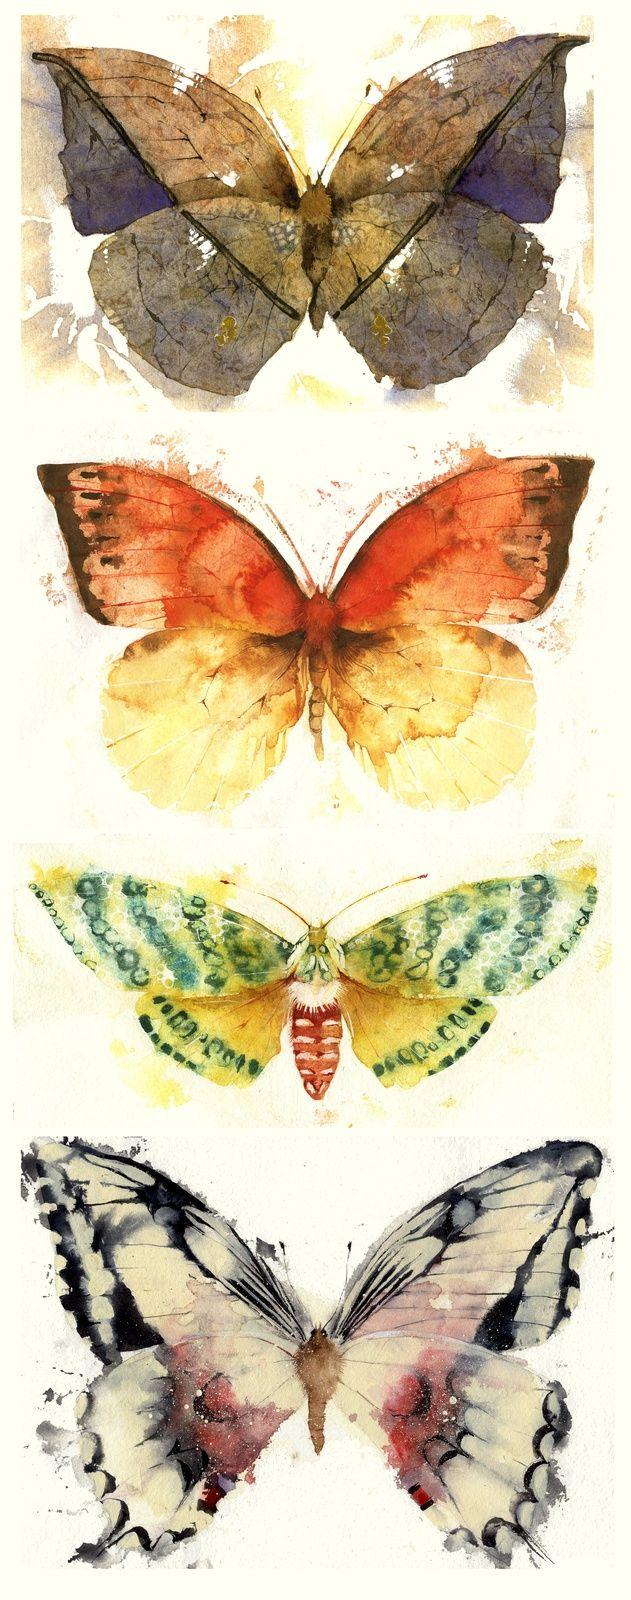 Butterflies and Moths, Giclée print by Kate Osborne | Artfinder